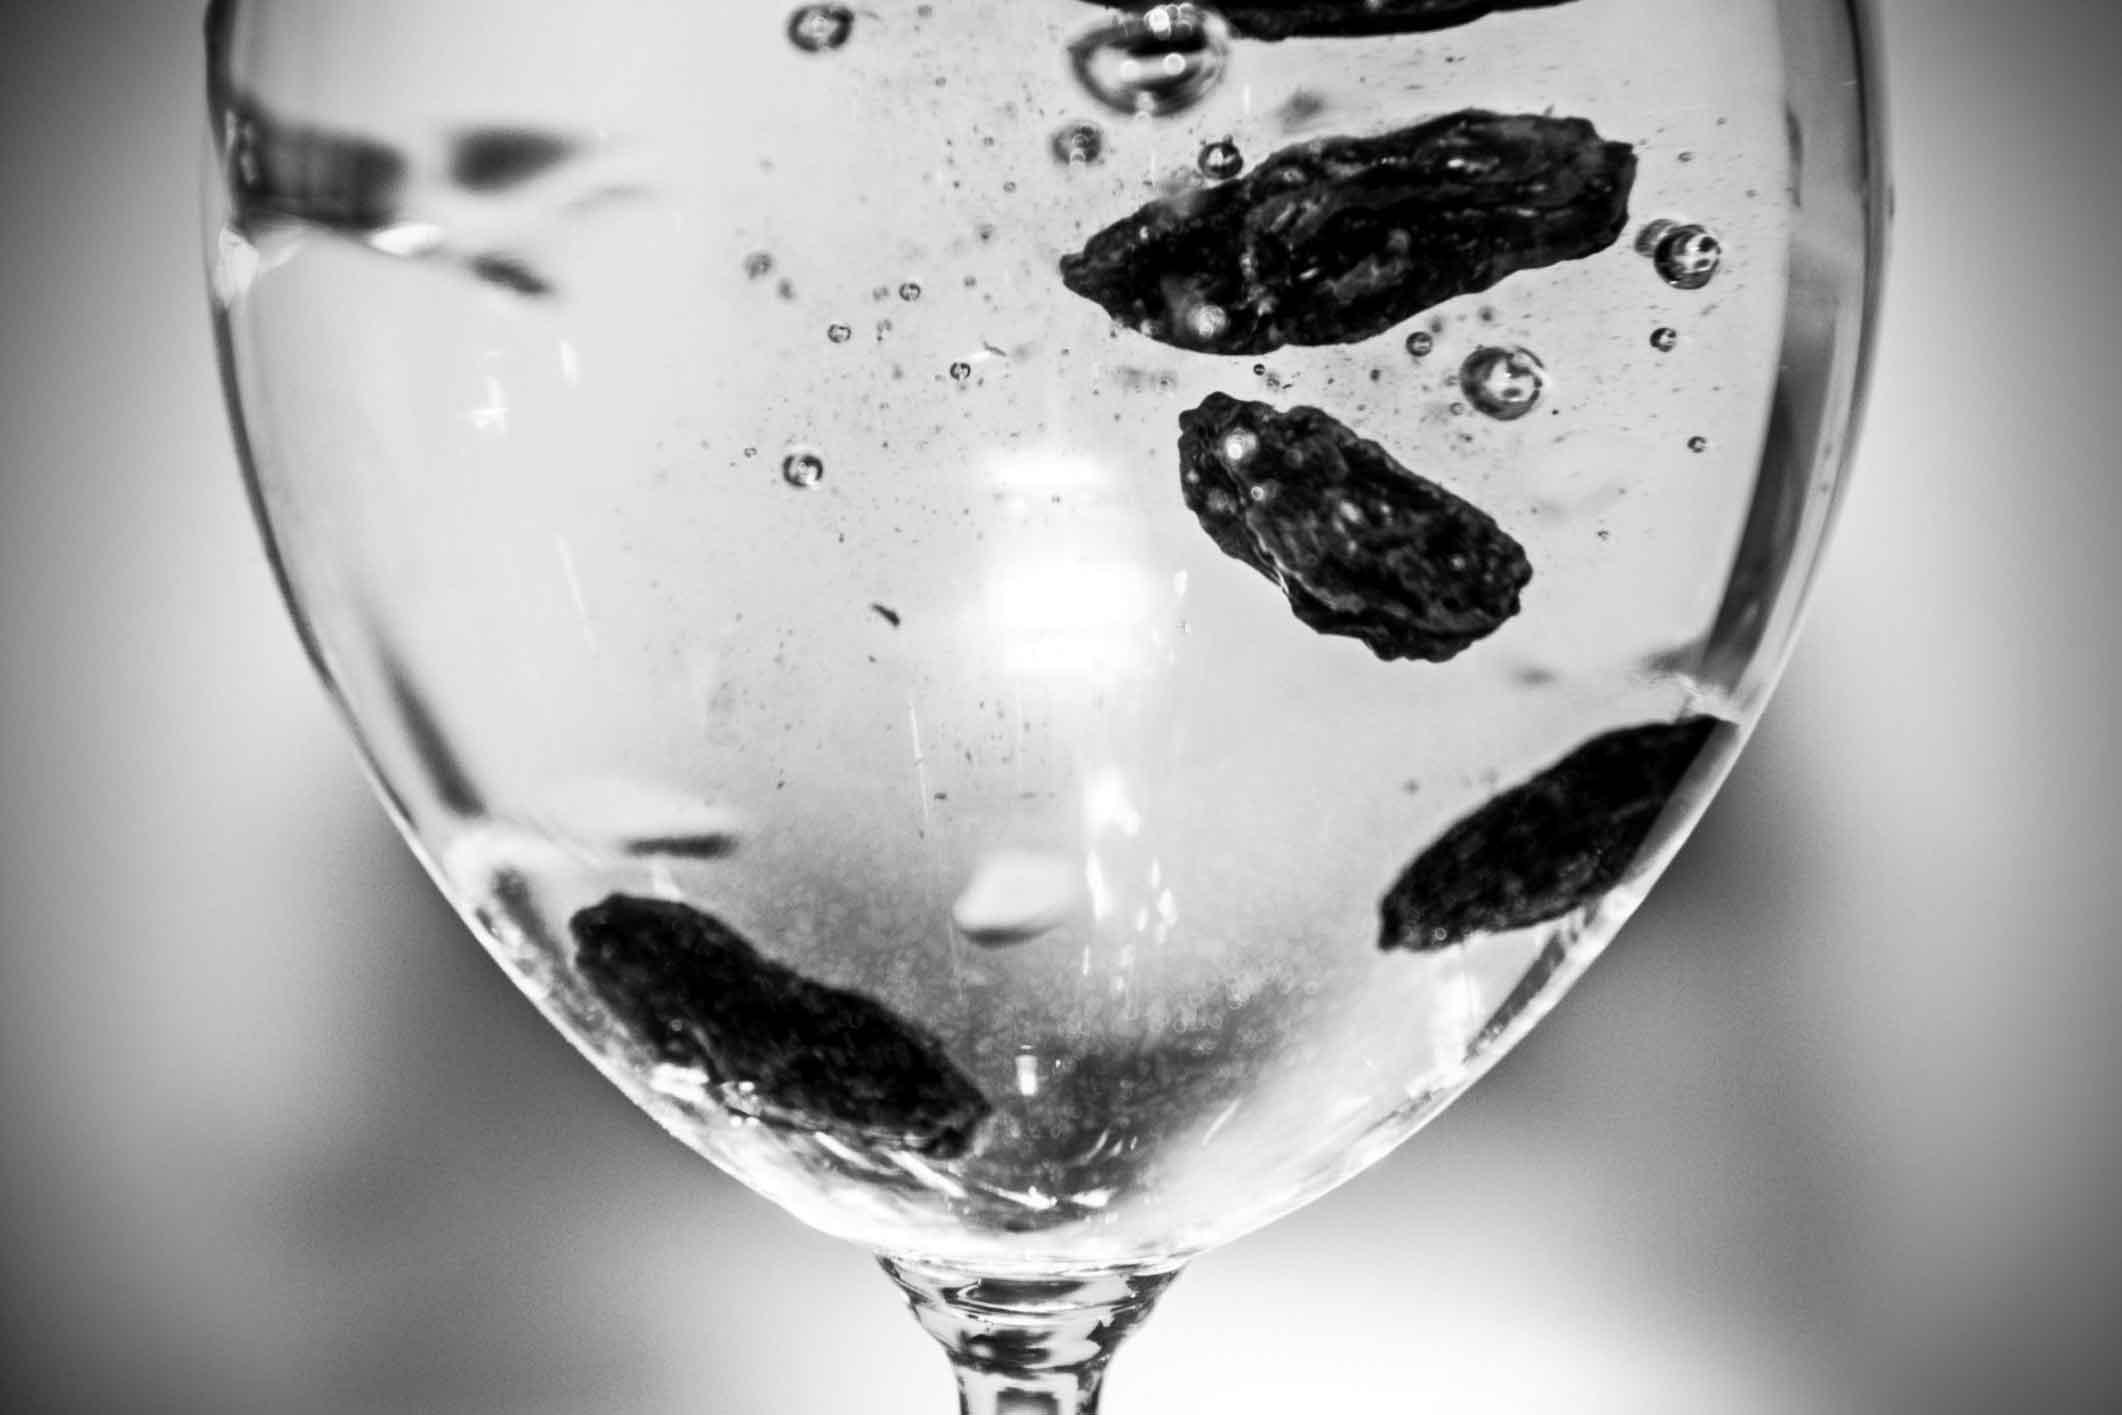 Raisins in 100 ml of water overnight  Voxitatis Blog